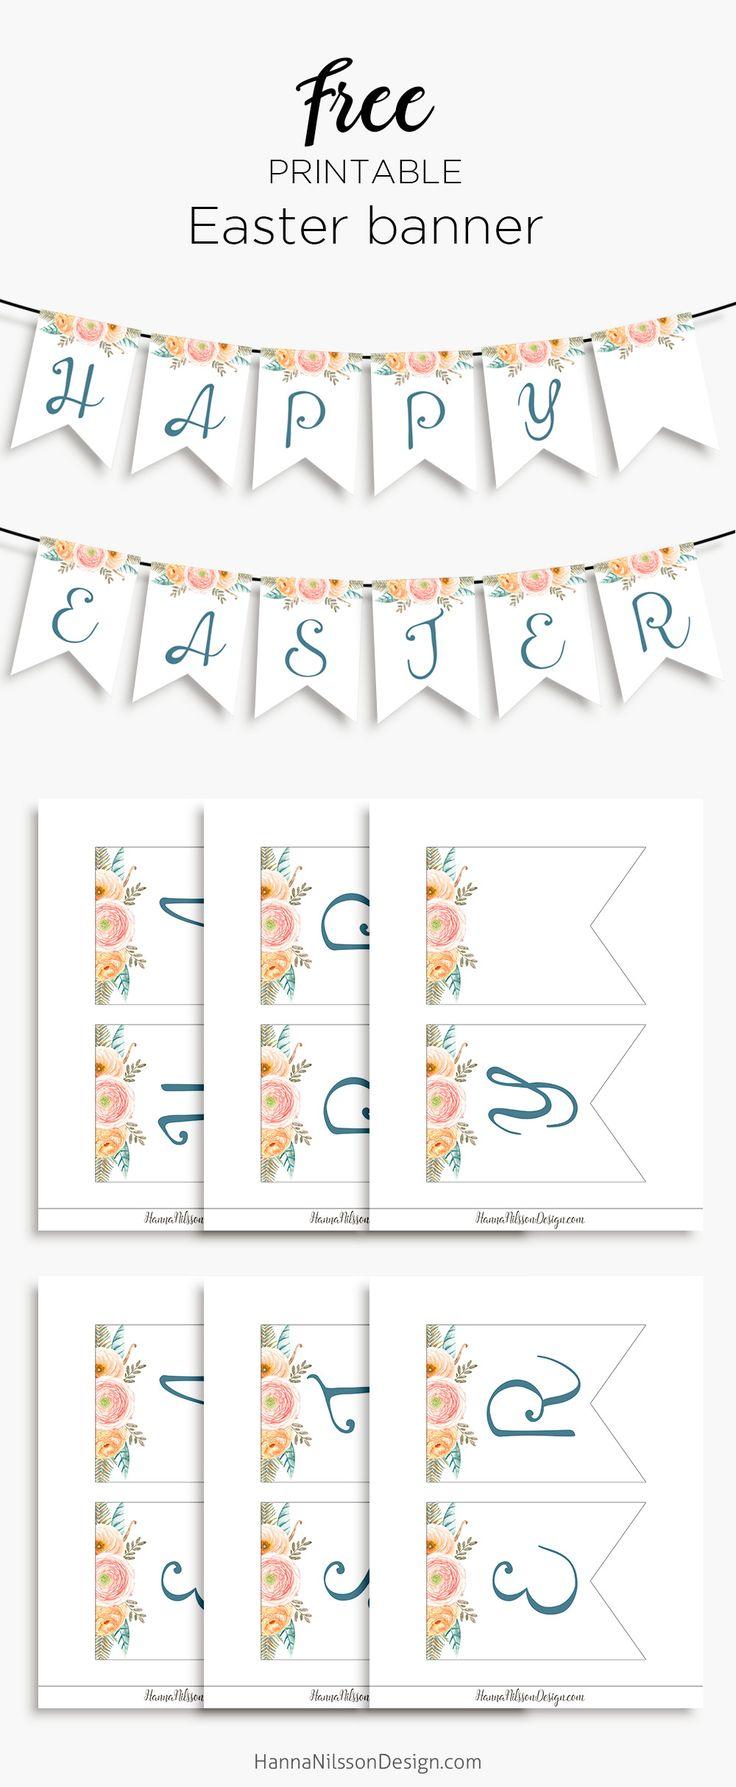 Best 25+ Free printable banner ideas on Pinterest | Printable ...